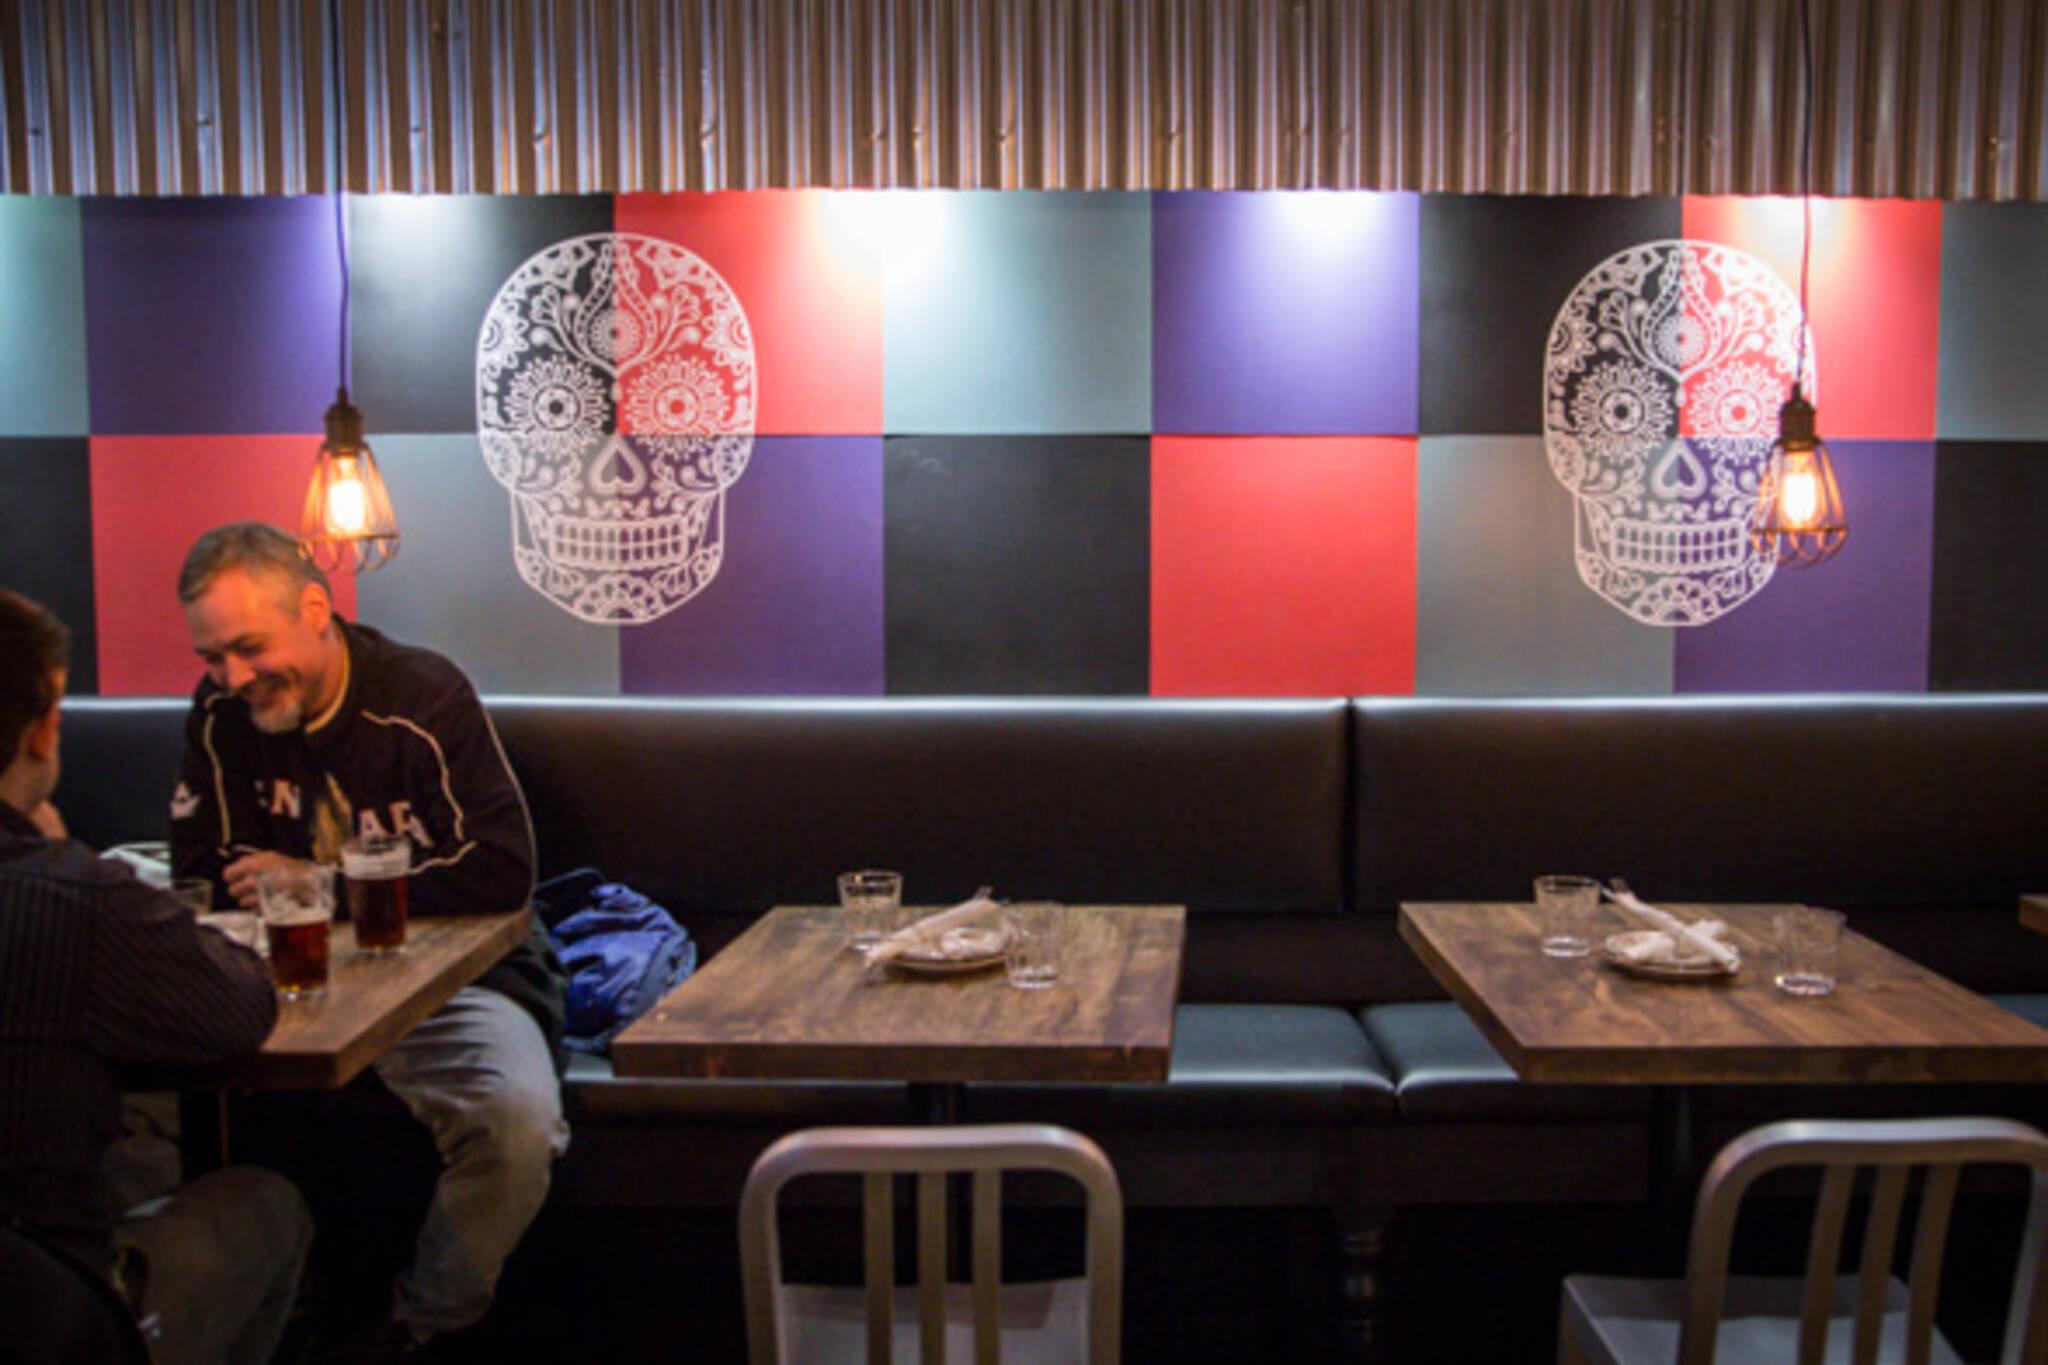 restaurant flops